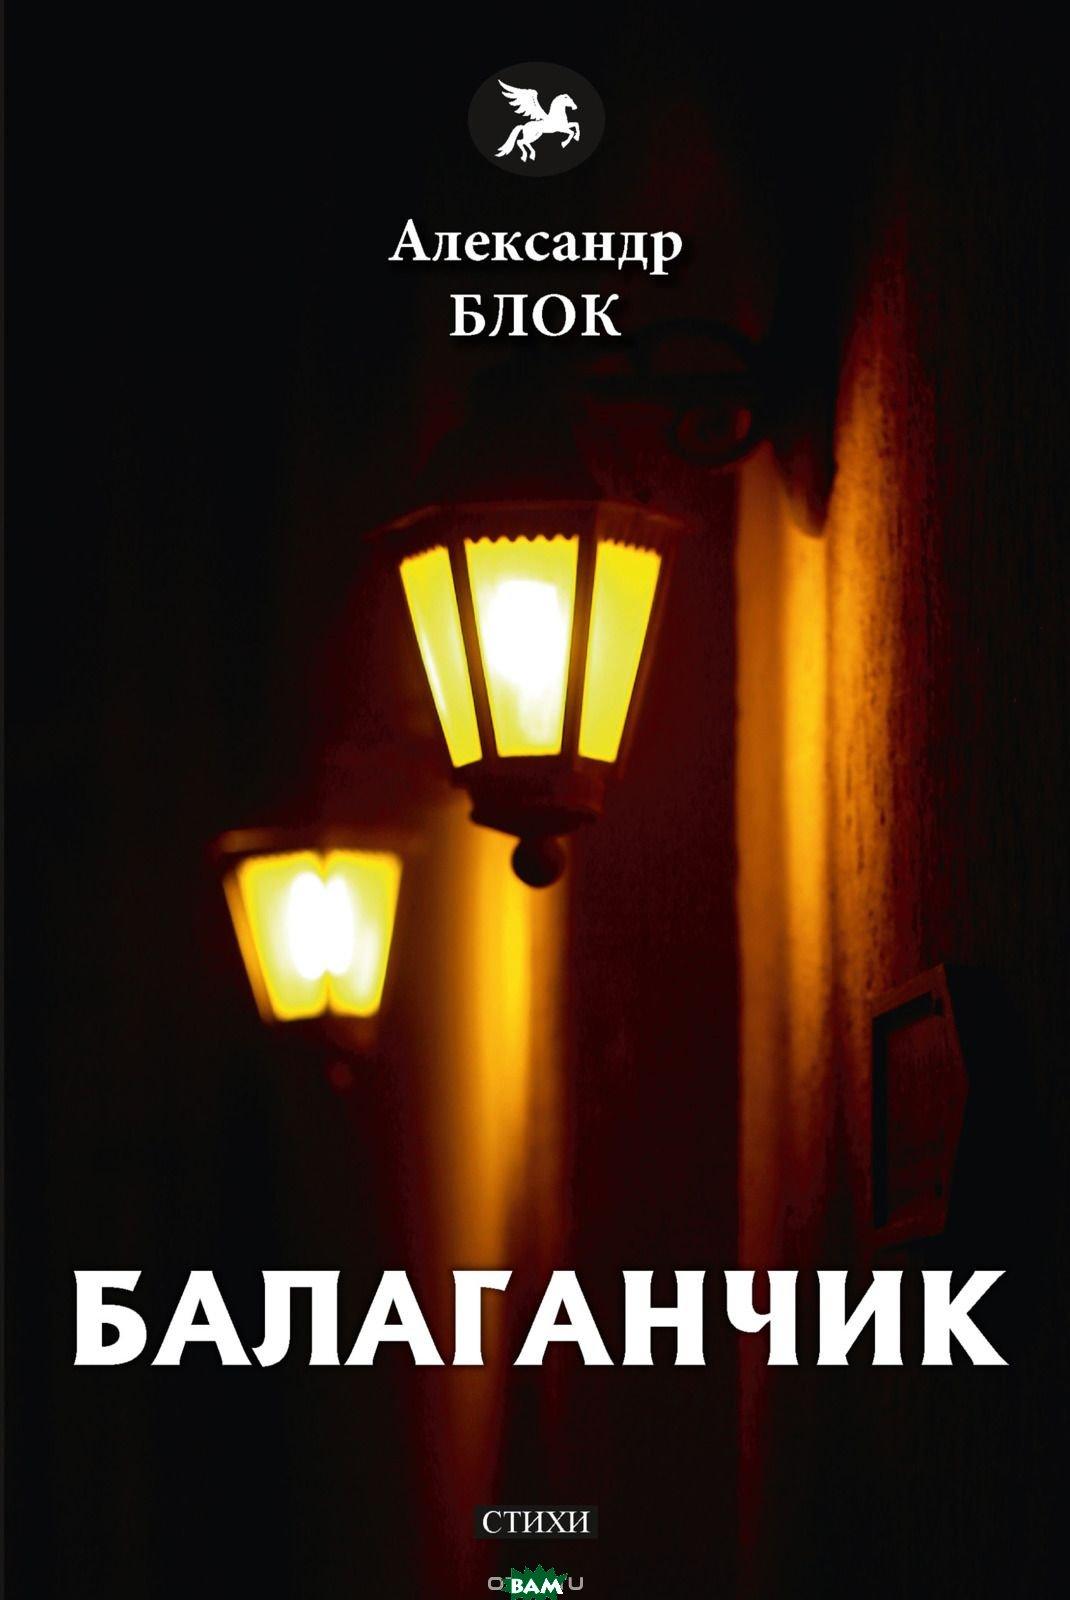 Купить Балаганчик. Том 4, T8RUGRAM, Блок Александр Александрович, 978-5-521-06992-7